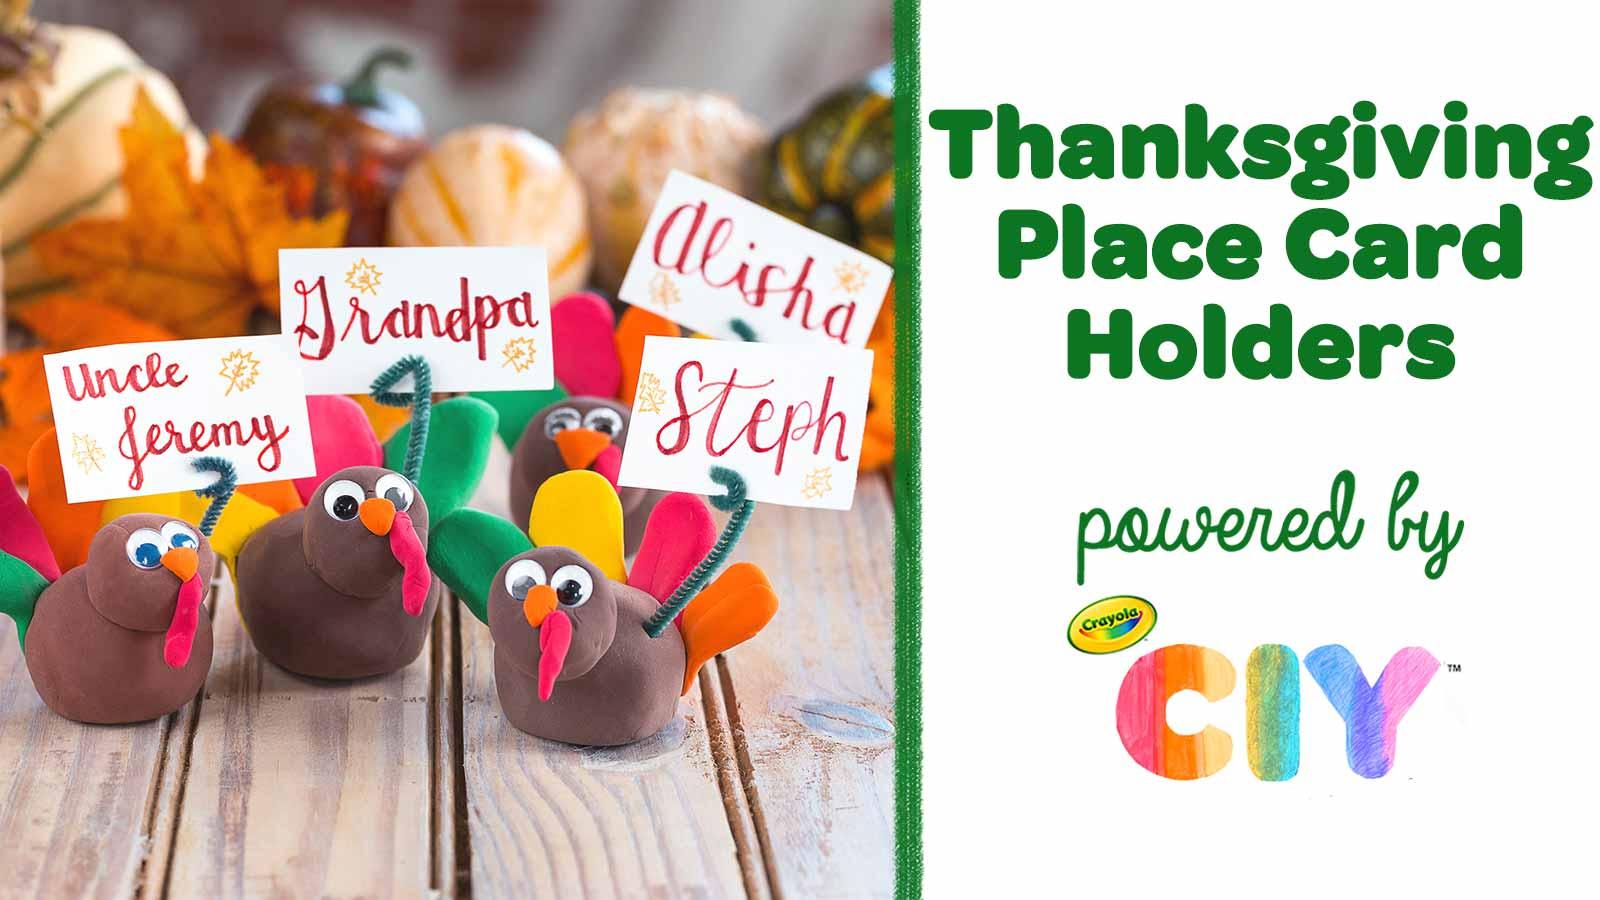 Diy Thanksgiving Place Card Holders Crafts Crayola Com Crayola Ciy Diy Crafts For Kids And Adults Crayola Com